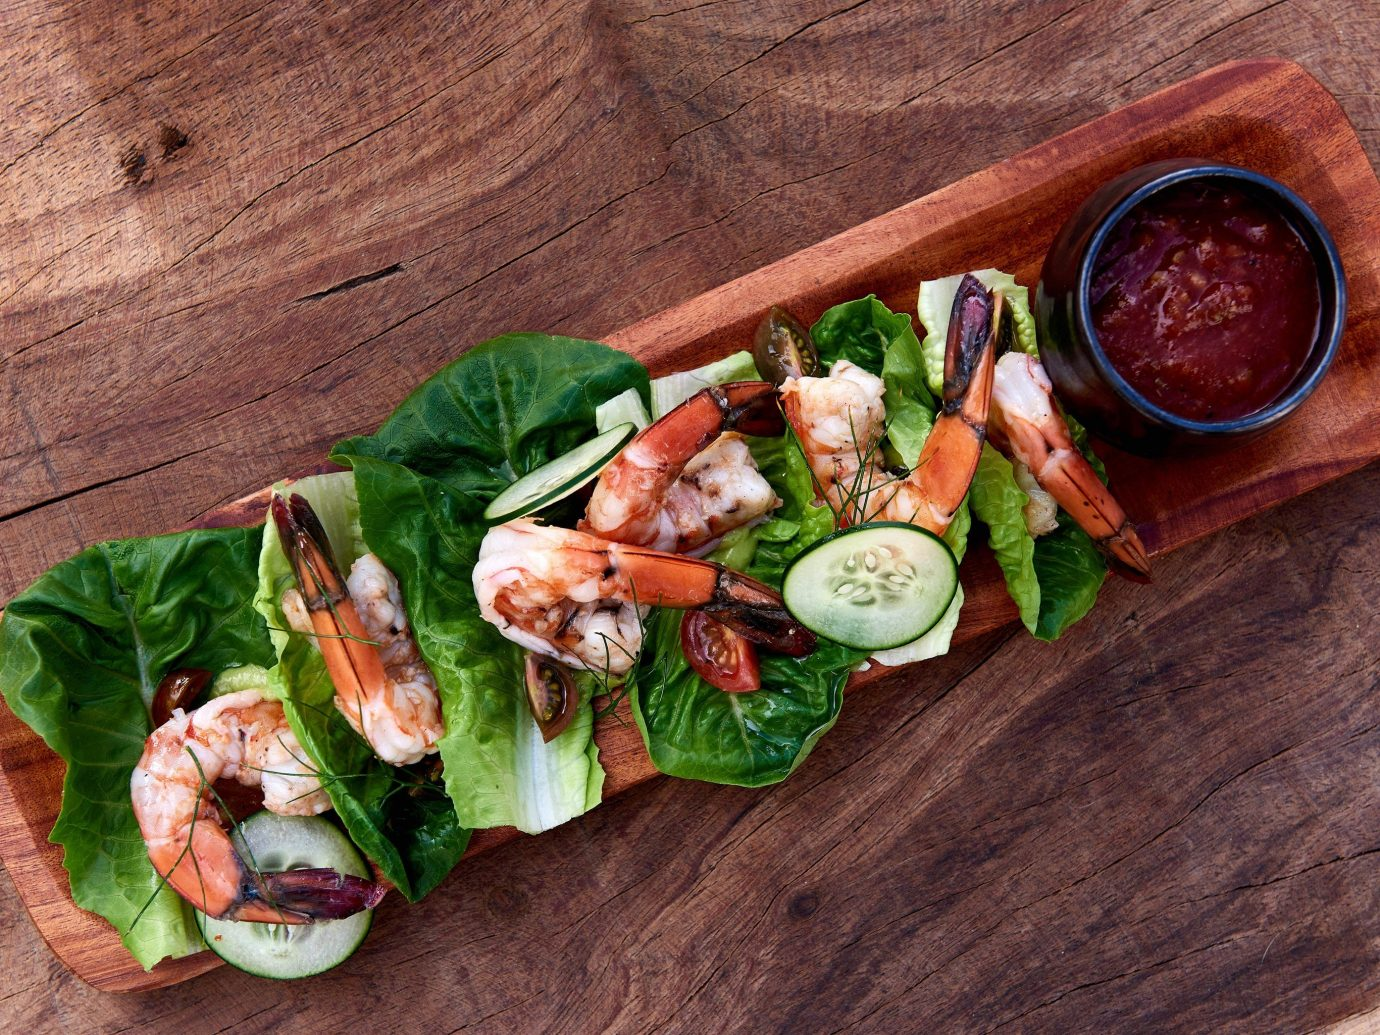 Trip Ideas ground food dish produce wooden vegetable flower cuisine herb meal flowering plant sandwich wood snack food